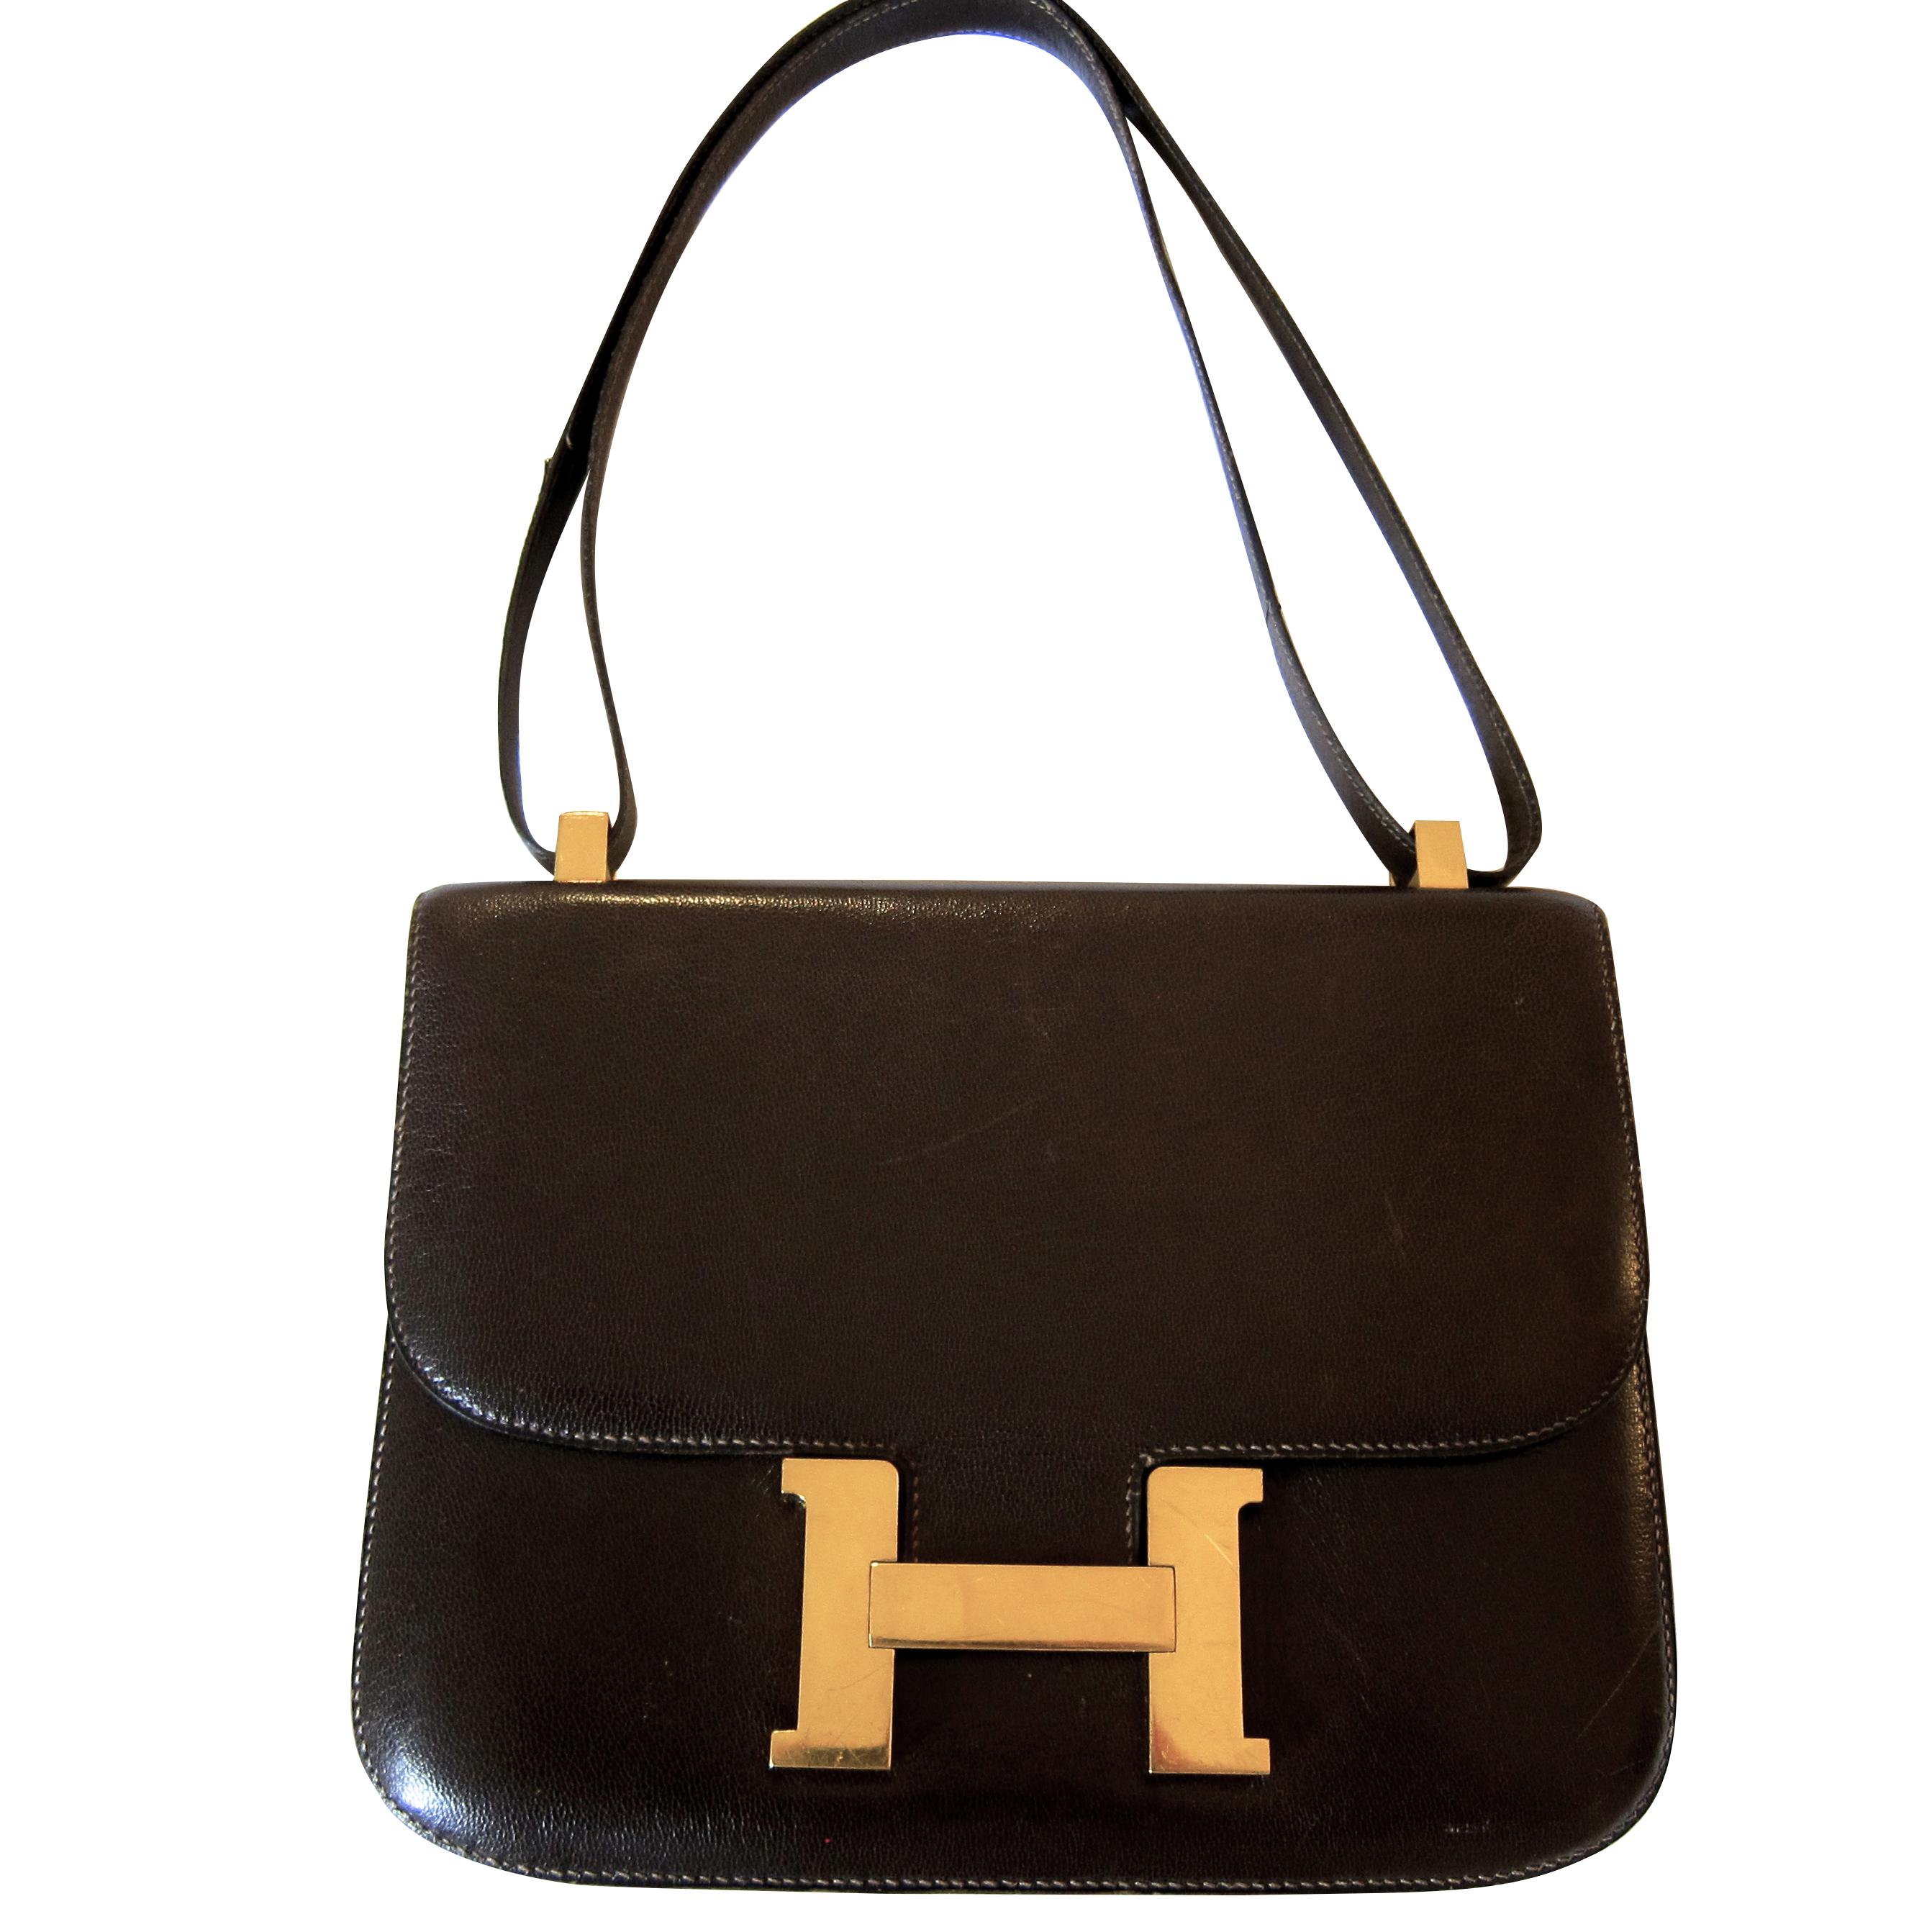 Hermes Constance handbag